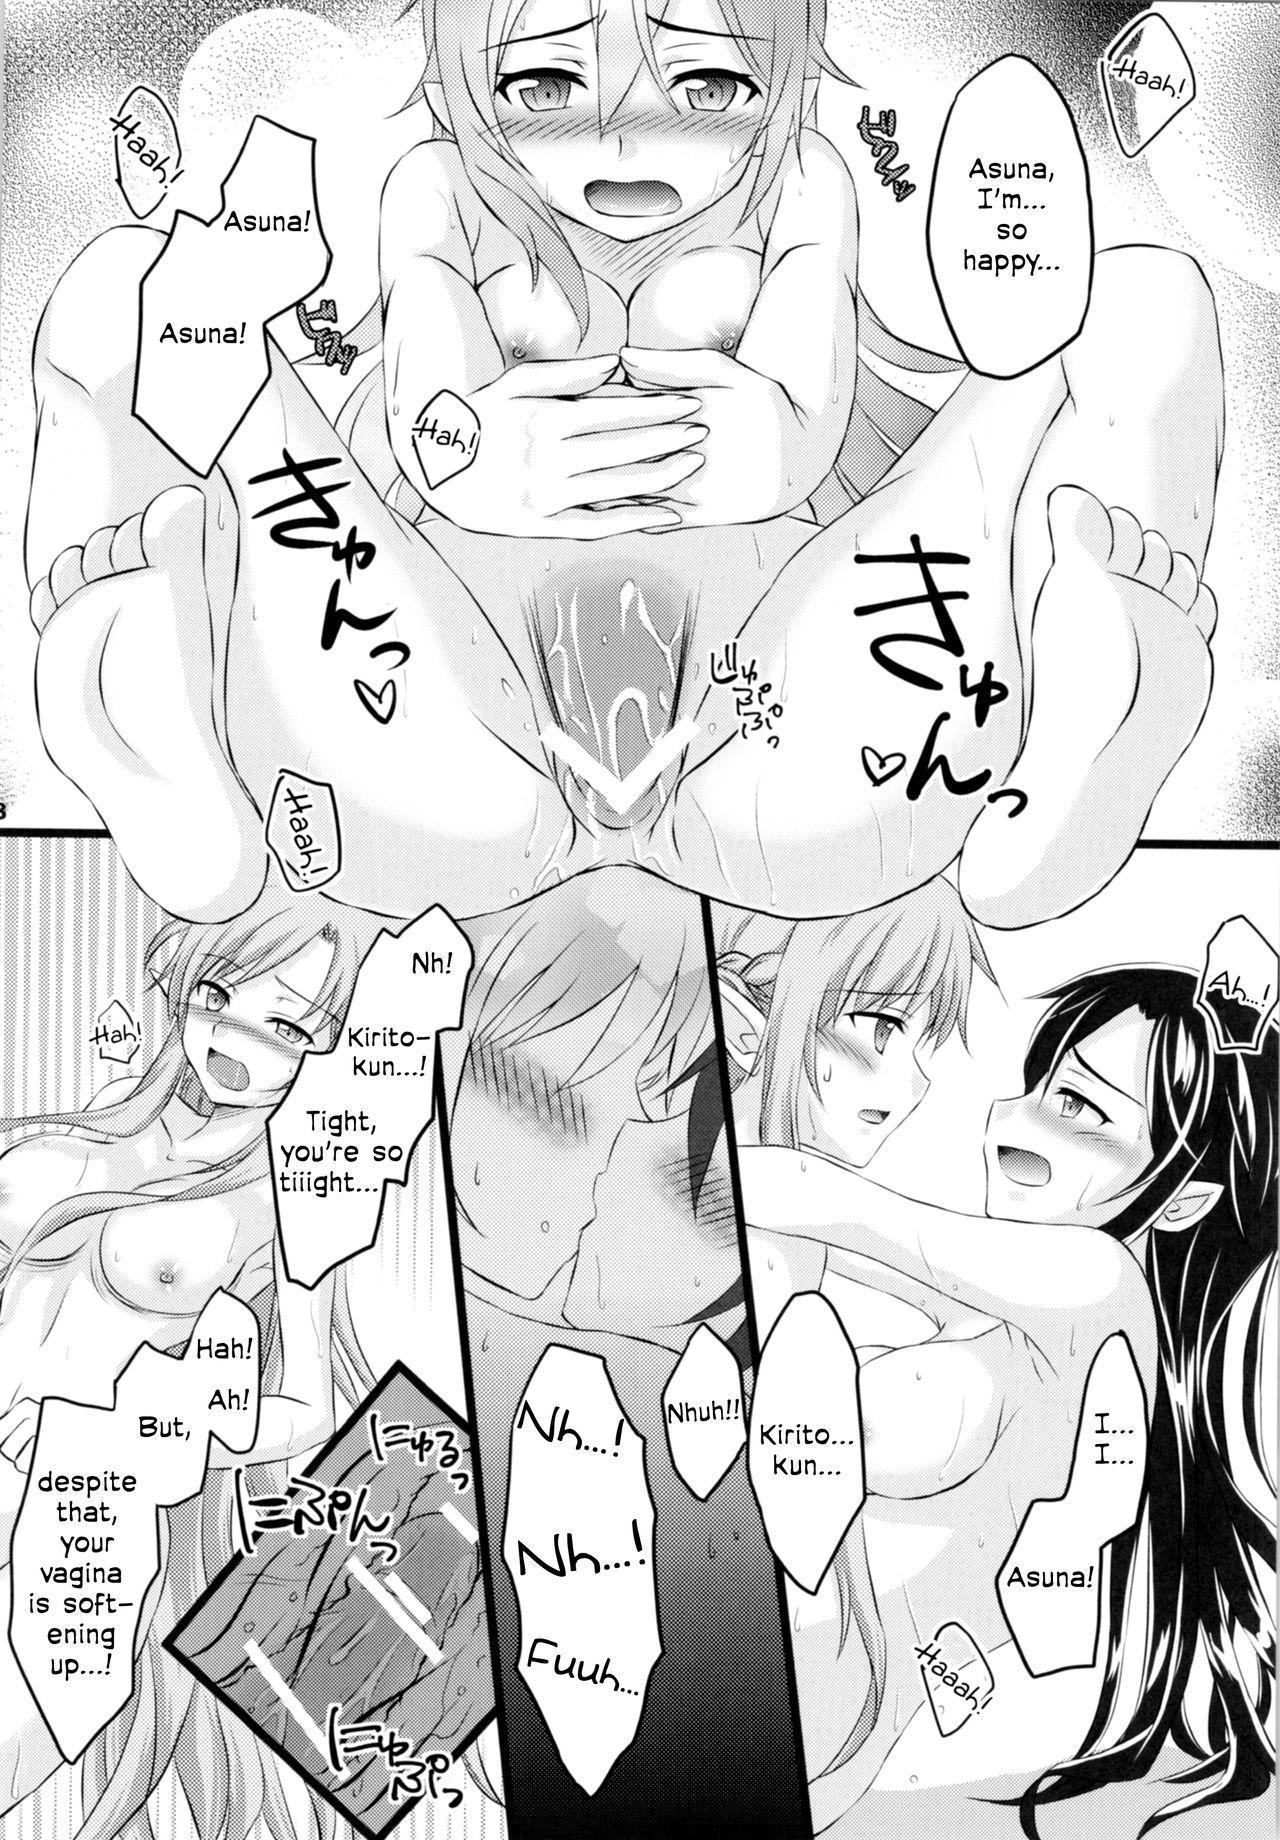 (C88) [AQUA SPACE (Asuka)] Kiriko-chan to Asobou! 2   Let's play with Kiriko-chan! 2 (Sword Art Online) [English] [EHCOVE] 16